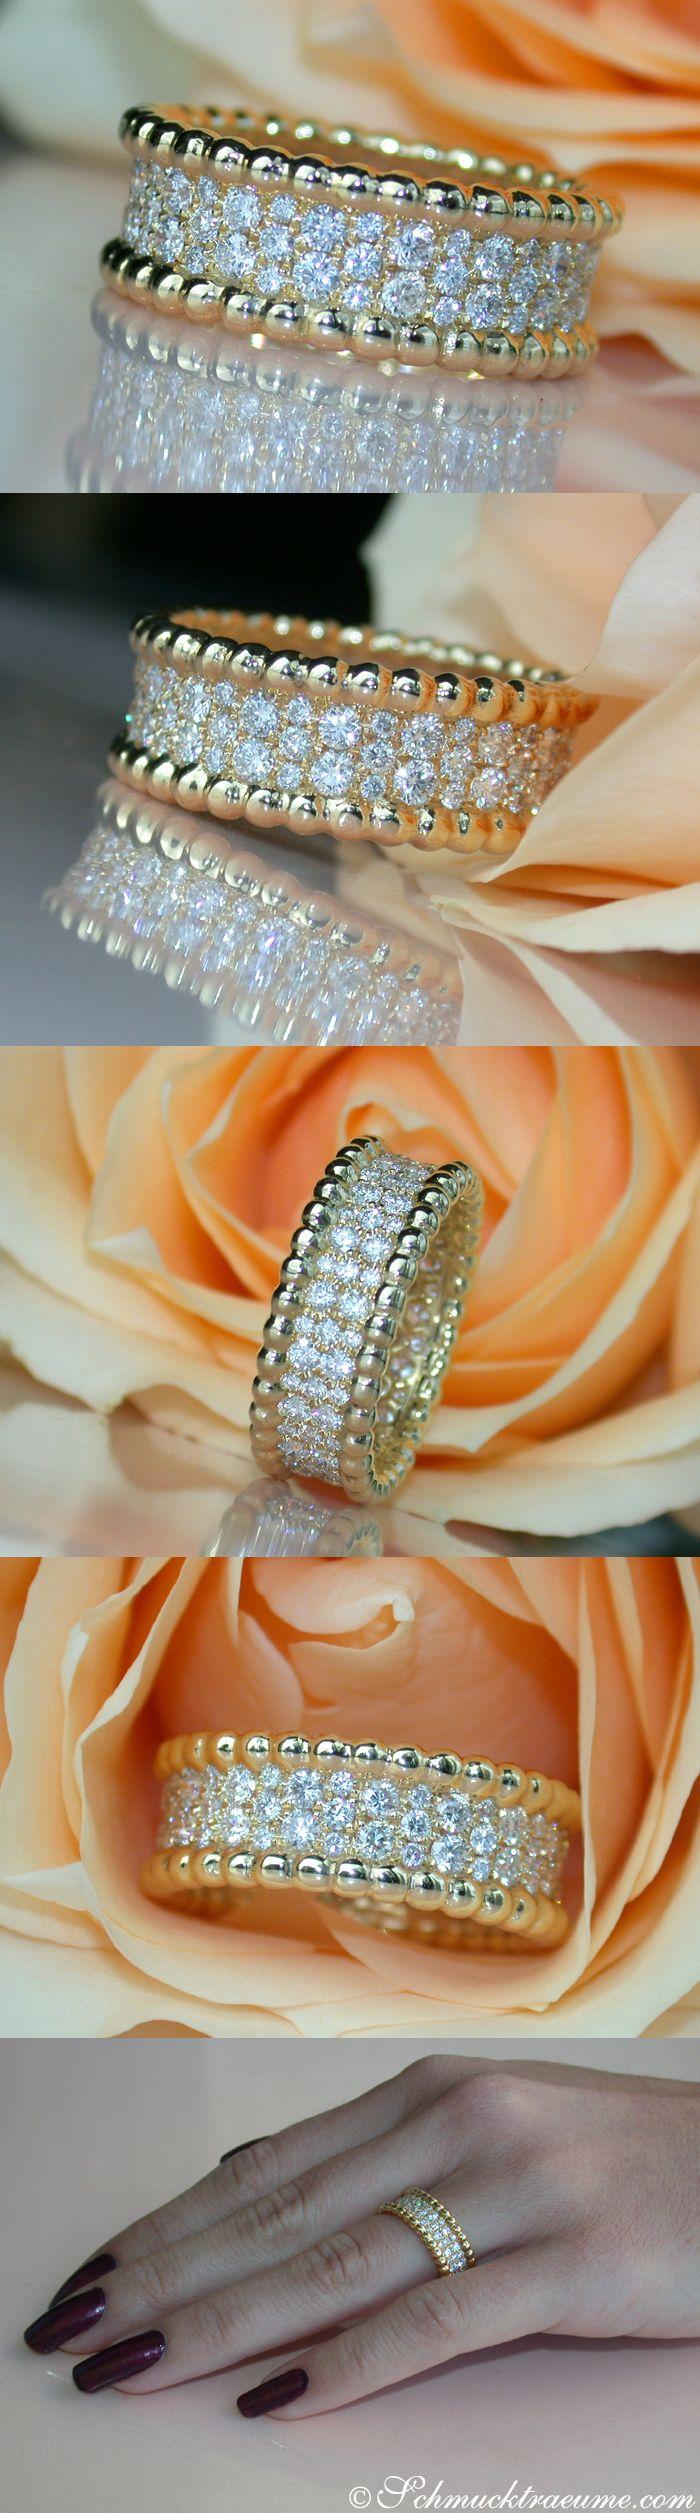 Gorgeous Diamond Eternity Ring, 1.29 ct. G-VS, YG-18K - Visit: schmucktraeume.com Like: https://www.facebook.com/pages/Noble-Juwelen/150871984924926 Mail: info[at]schmucktraeume.com